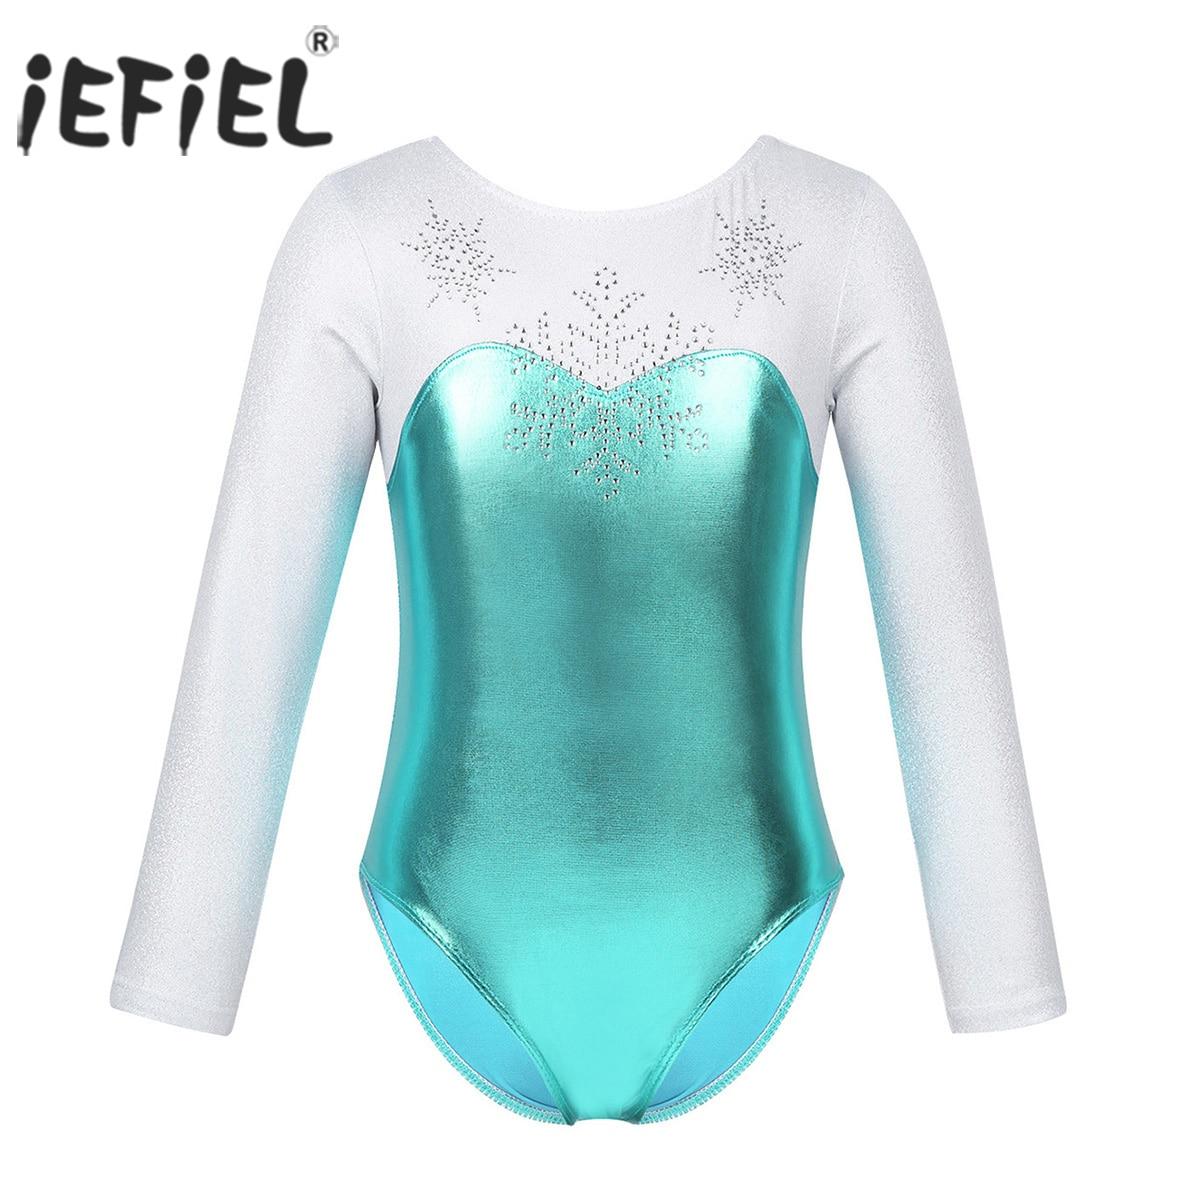 iEFiEL Kids Girls Dance Sports Outfits Ballet Gymnastics Leotard Crop Tops Shirt with Booty Short Dance Costume